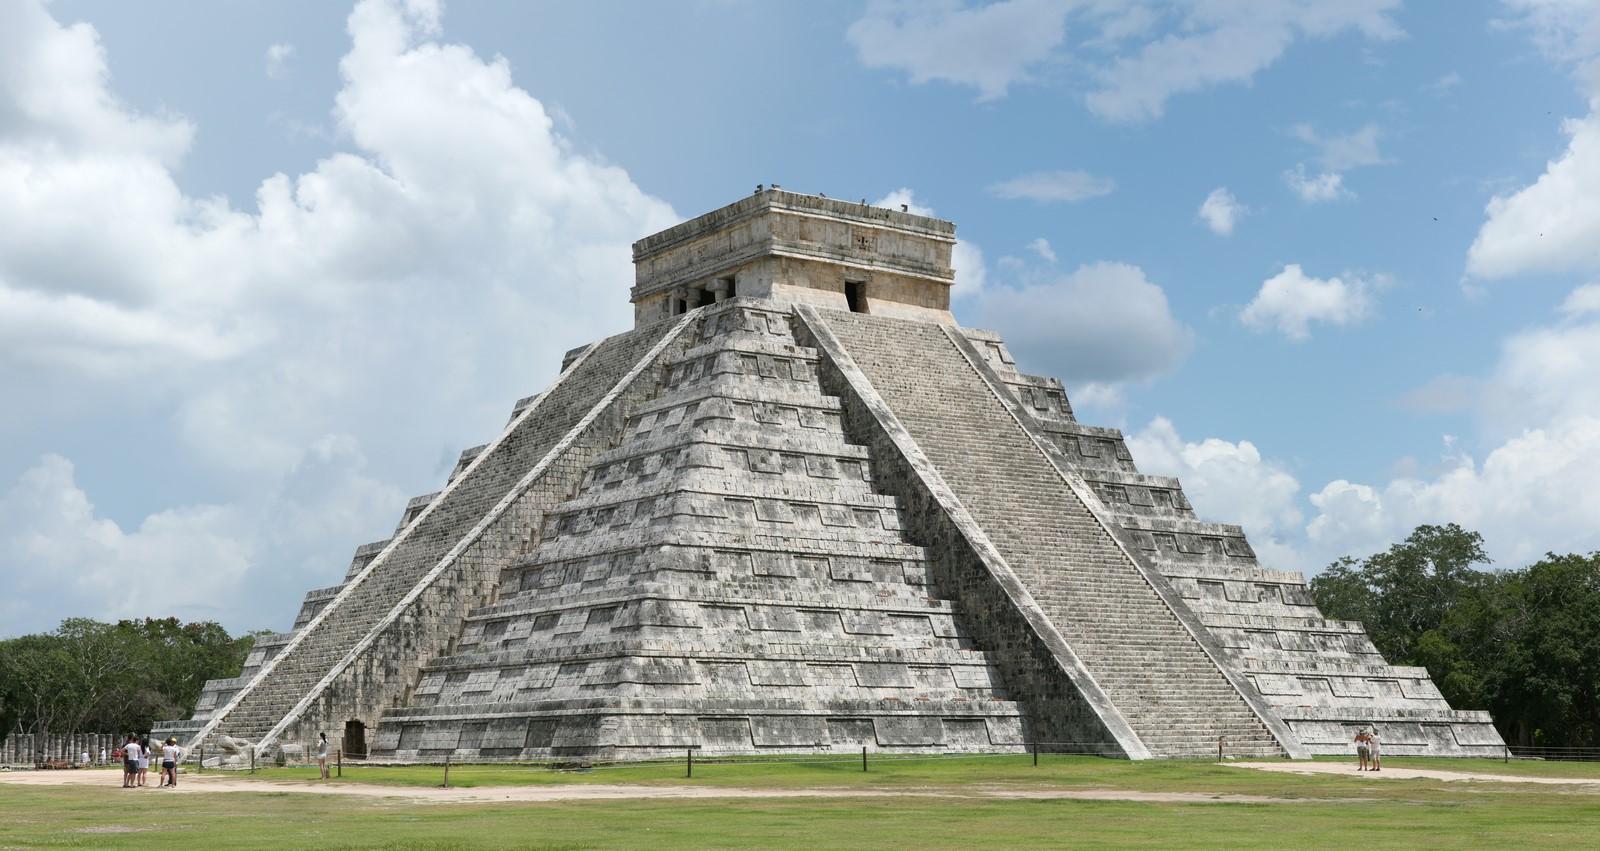 El Castillo, Chichen Itza, Mexico - Sheet1